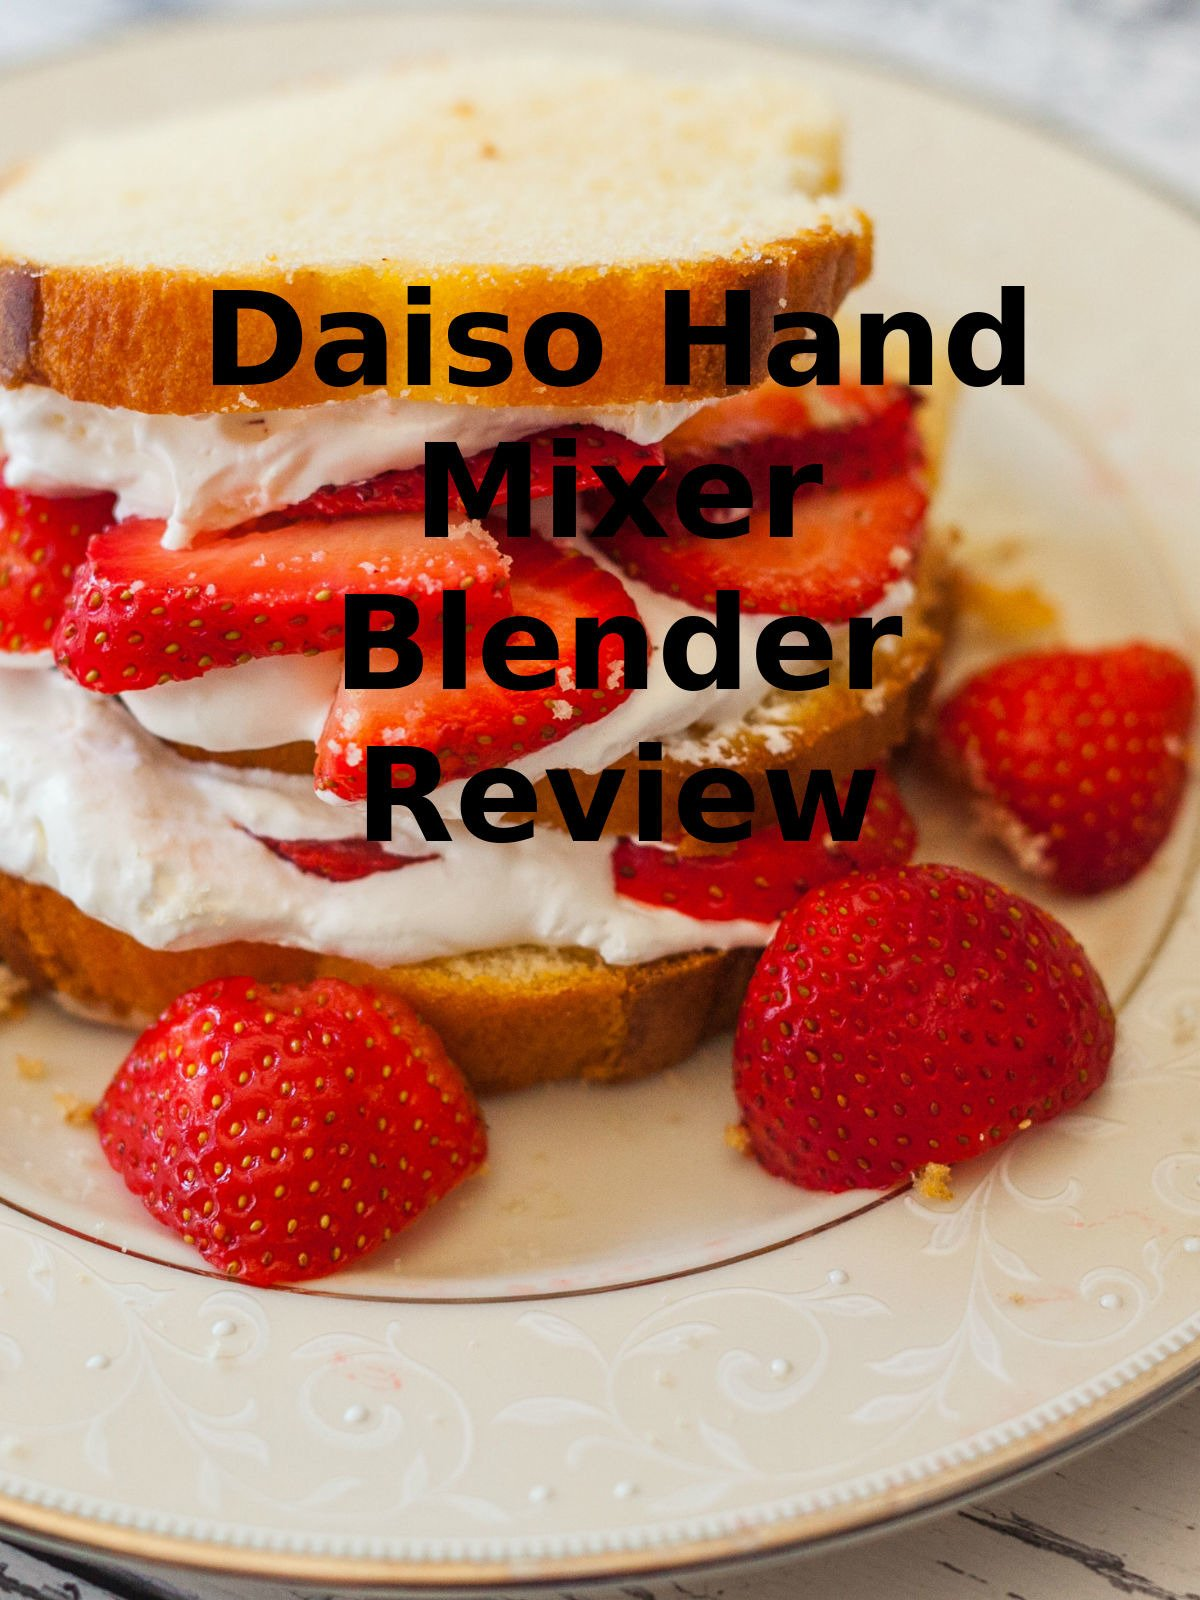 Review: Daiso Hand Mixer Blender Review